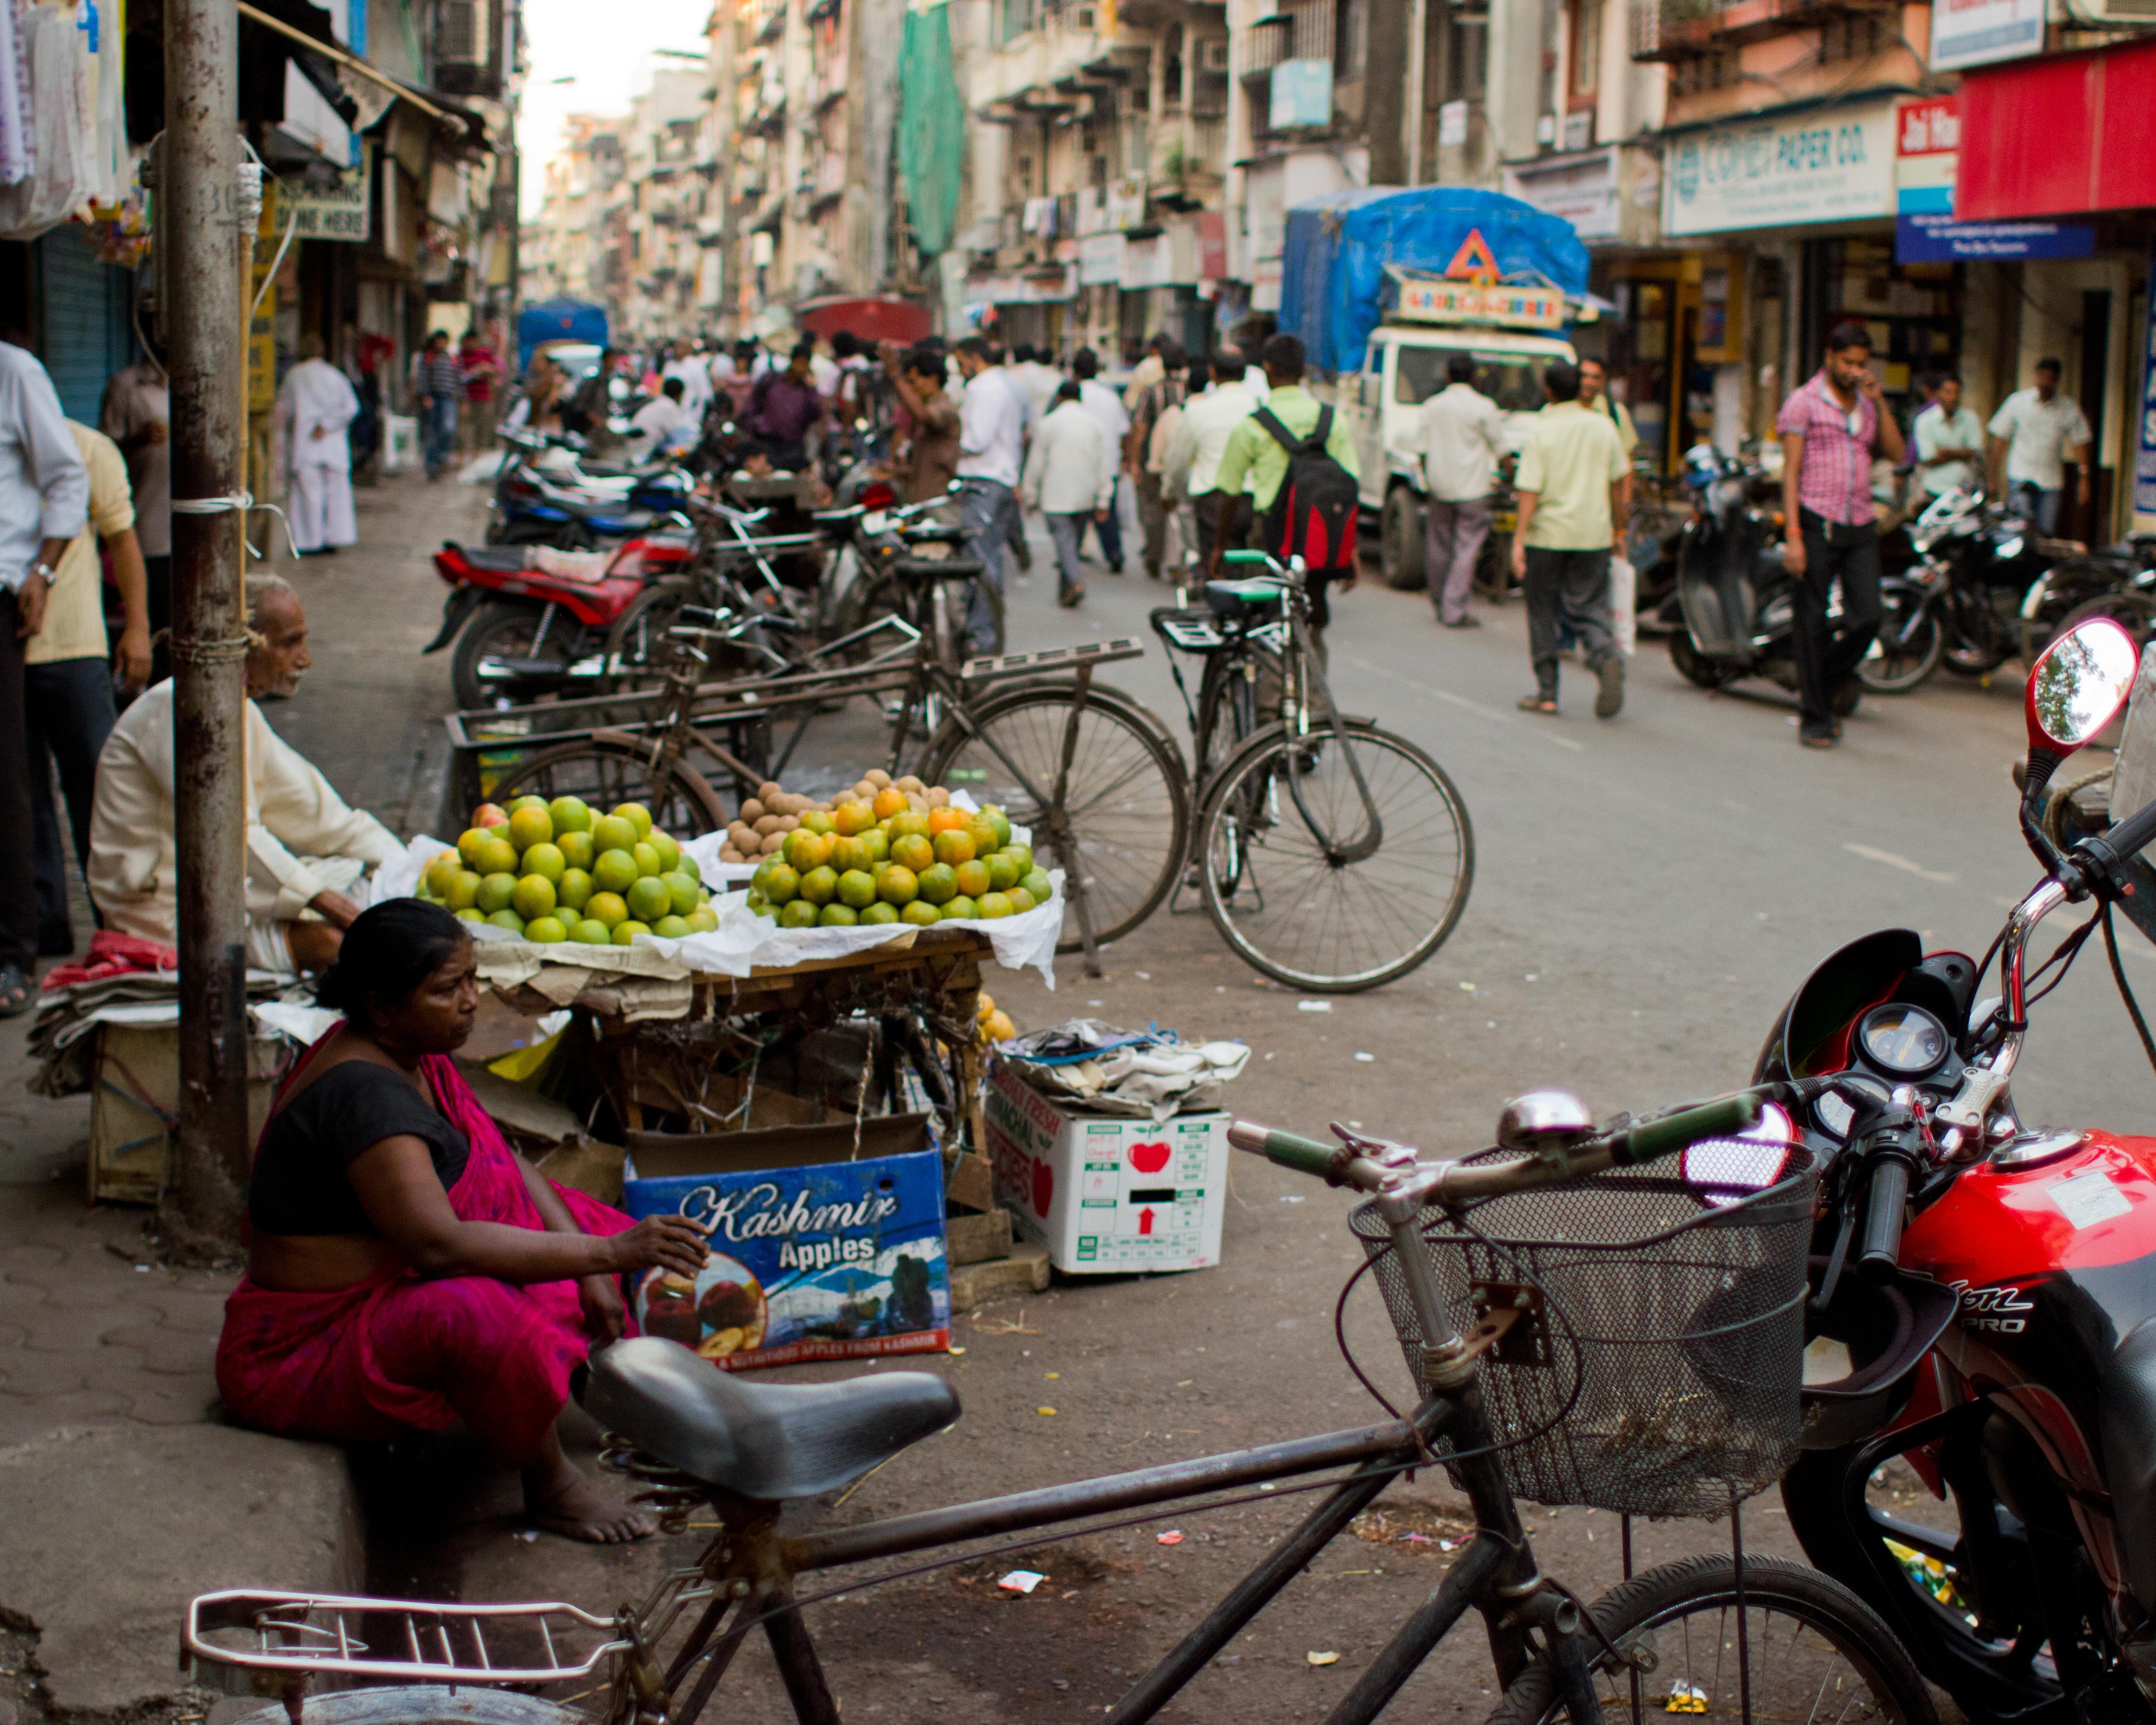 India Internship Deadline 171 Advise Me Weekly : IndiaMumbaiVictorGrigas2011 22 from advisemeweekly.lsa.umich.edu size 4320 x 3456 jpeg 4457kB